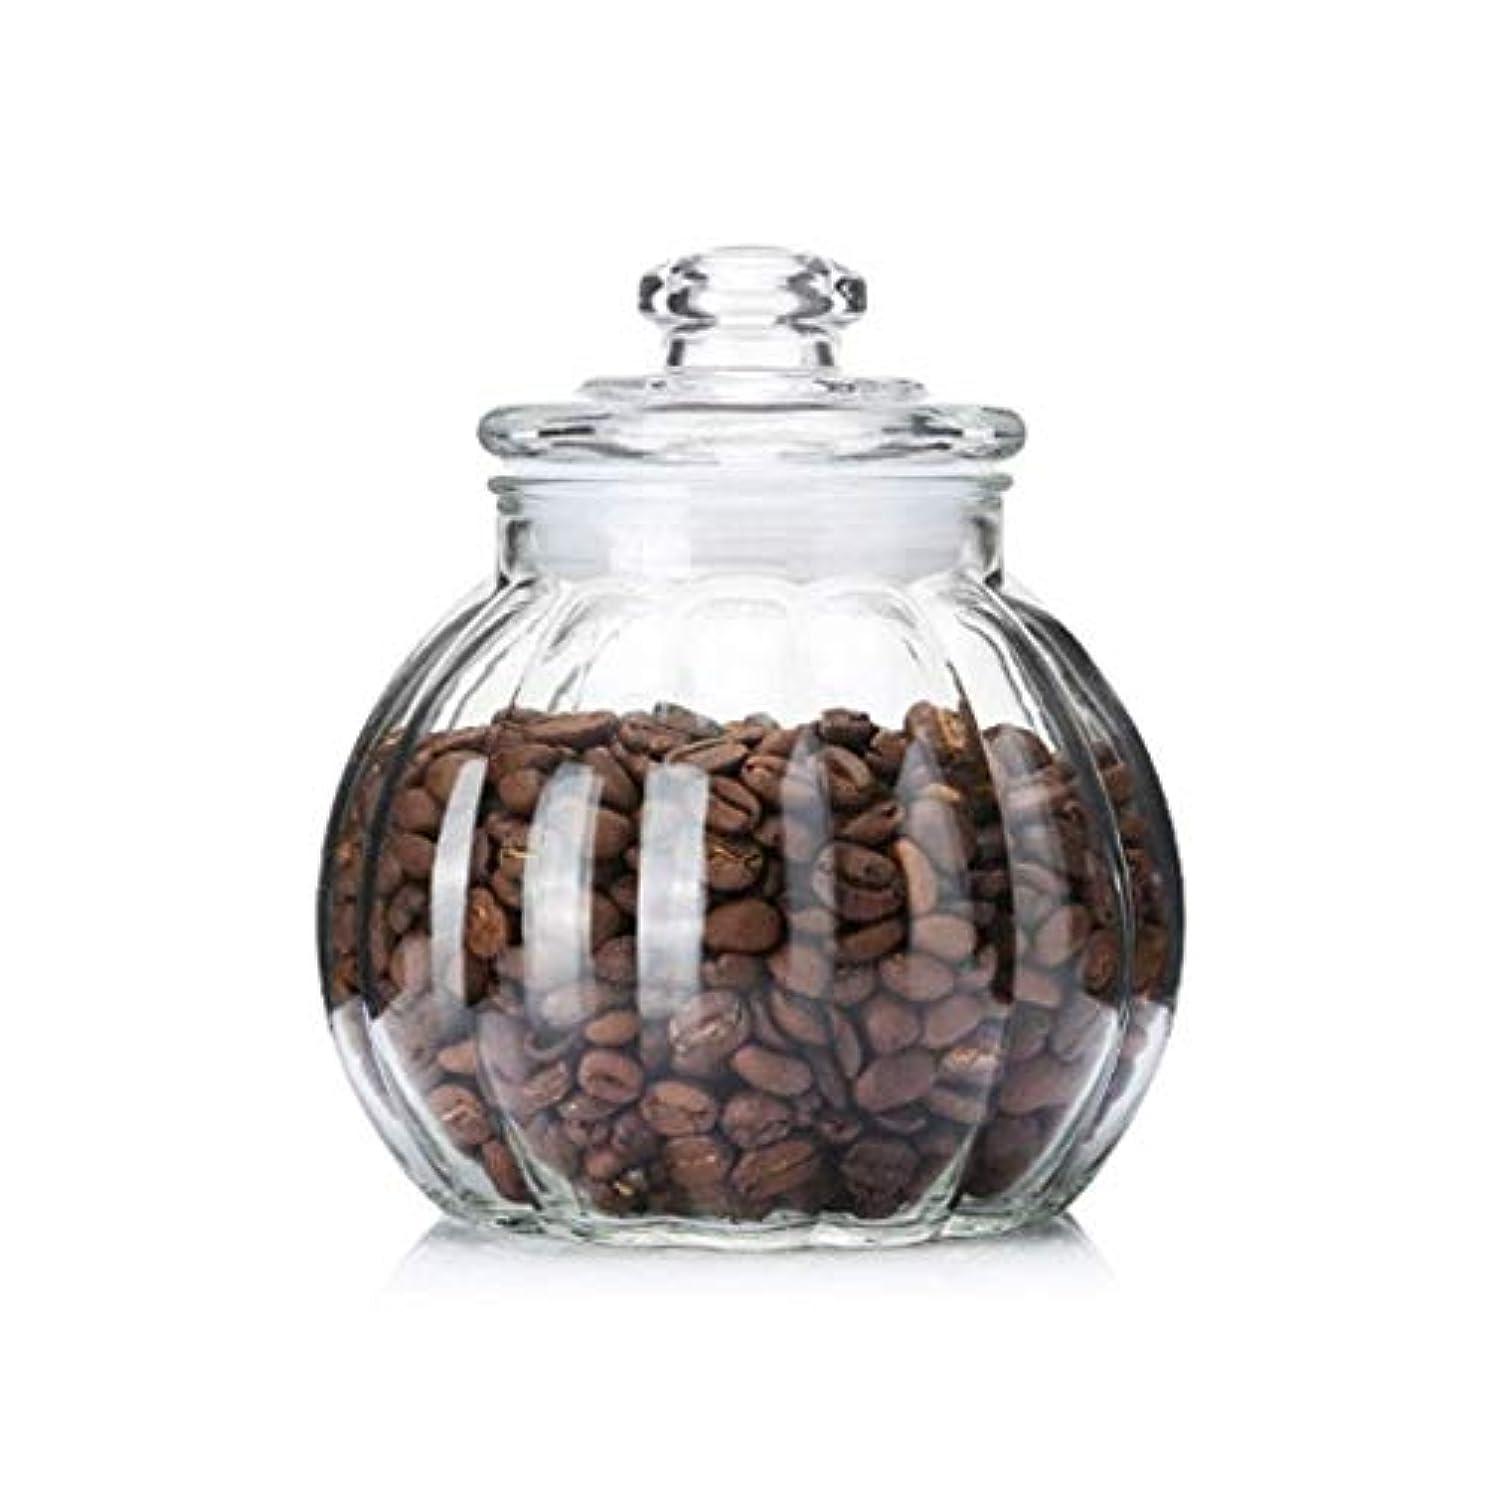 XSWZAQ ガラス瓶は蓋付き食品収納透明ガラス瓶は粉ミルクで充填蜂蜜茶穀物貯蔵タンク (Size : 1300ml)